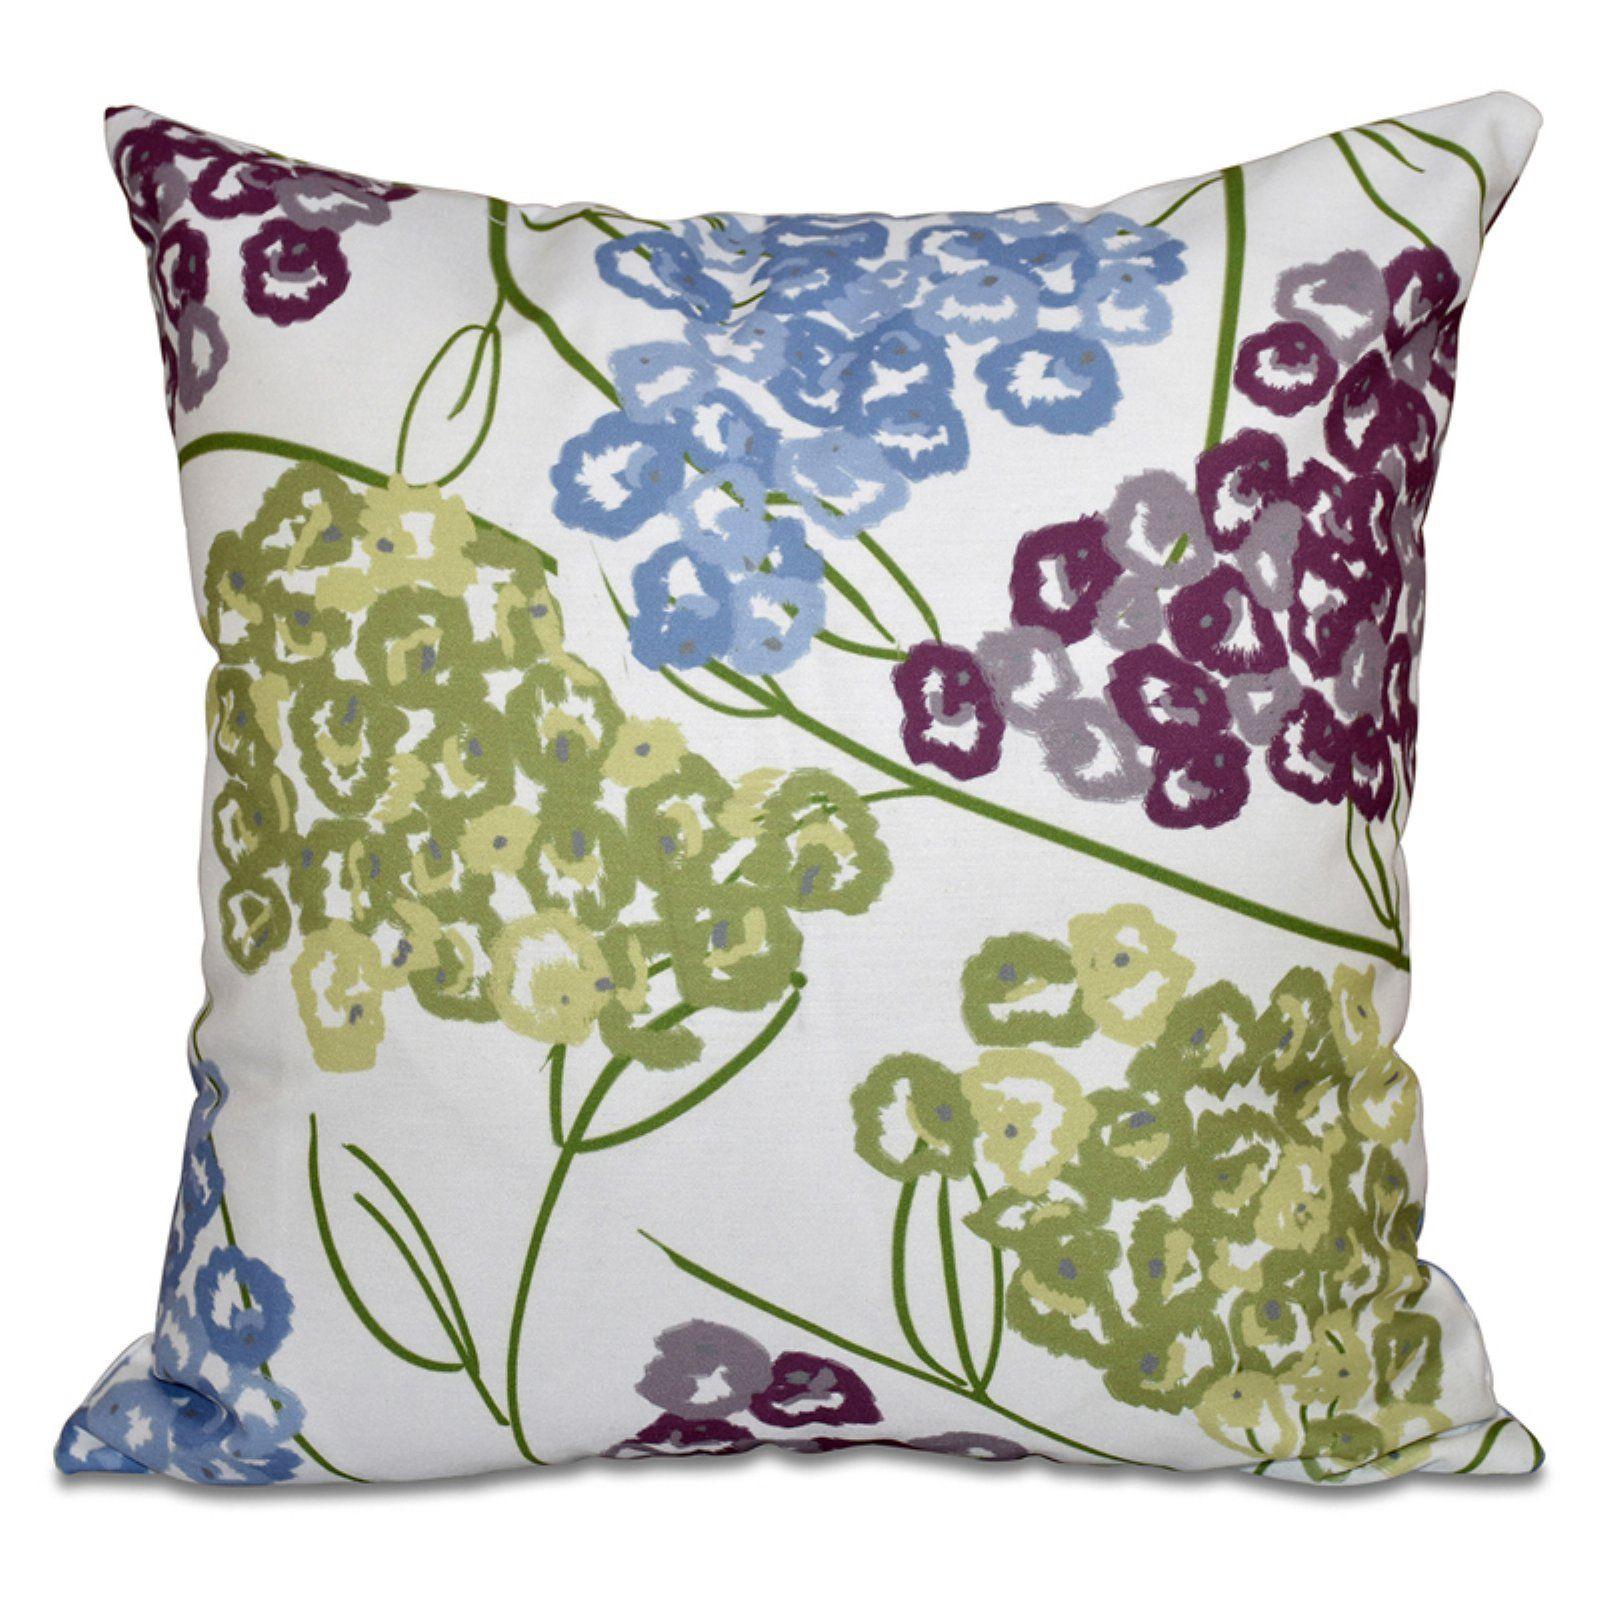 E by Design Beach Vacation Hydrangeas Decorative Pillow Purple / Green / Blue